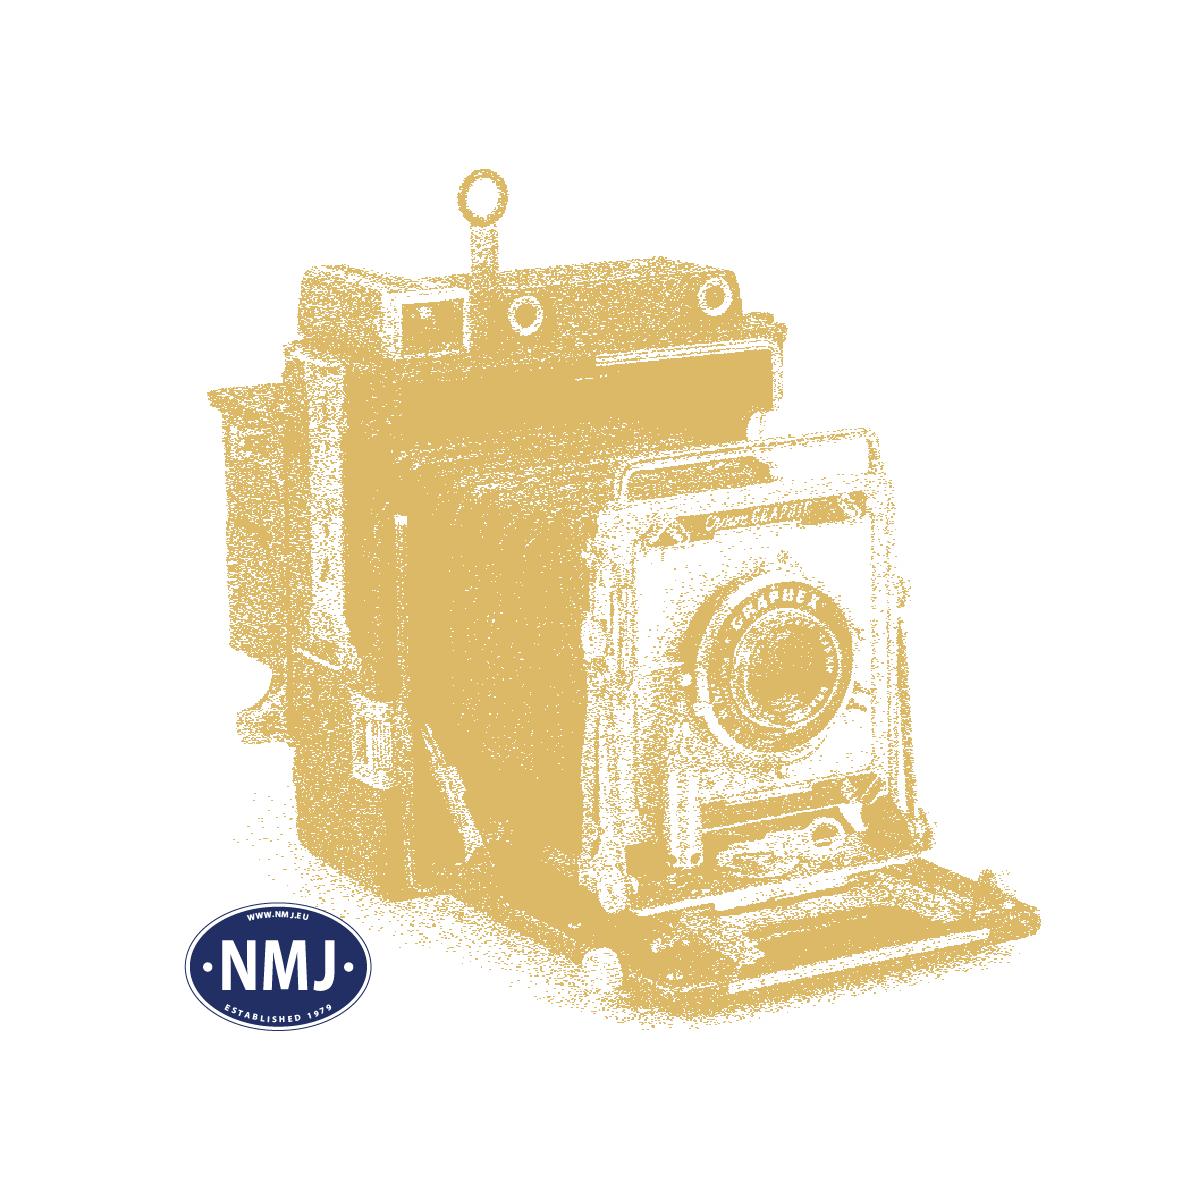 NMJT81.992 - NMJ Topline Interior Light Set for BM73, 4 Part, DC/DCC